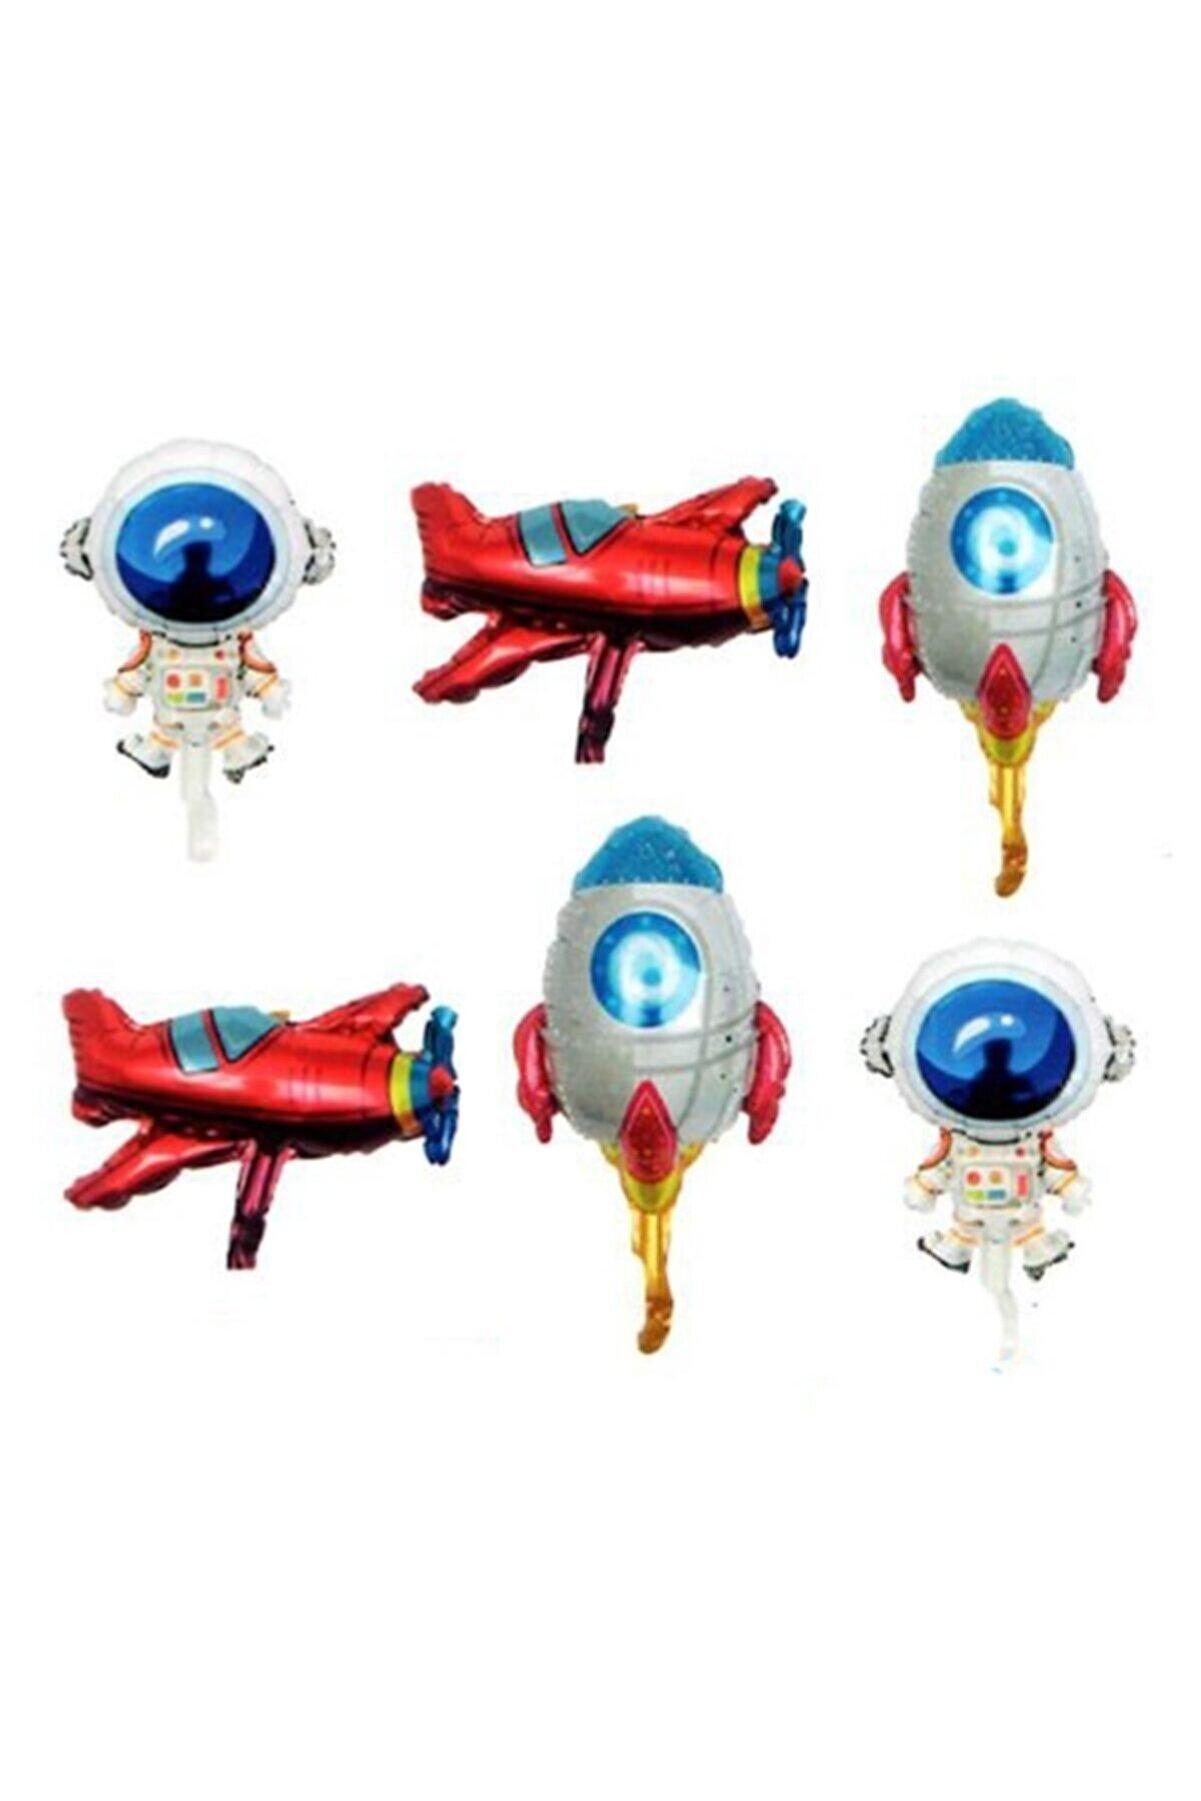 RPS Uzay Konsepti 6 Lı Folyo Balon Seti - 14 Inch